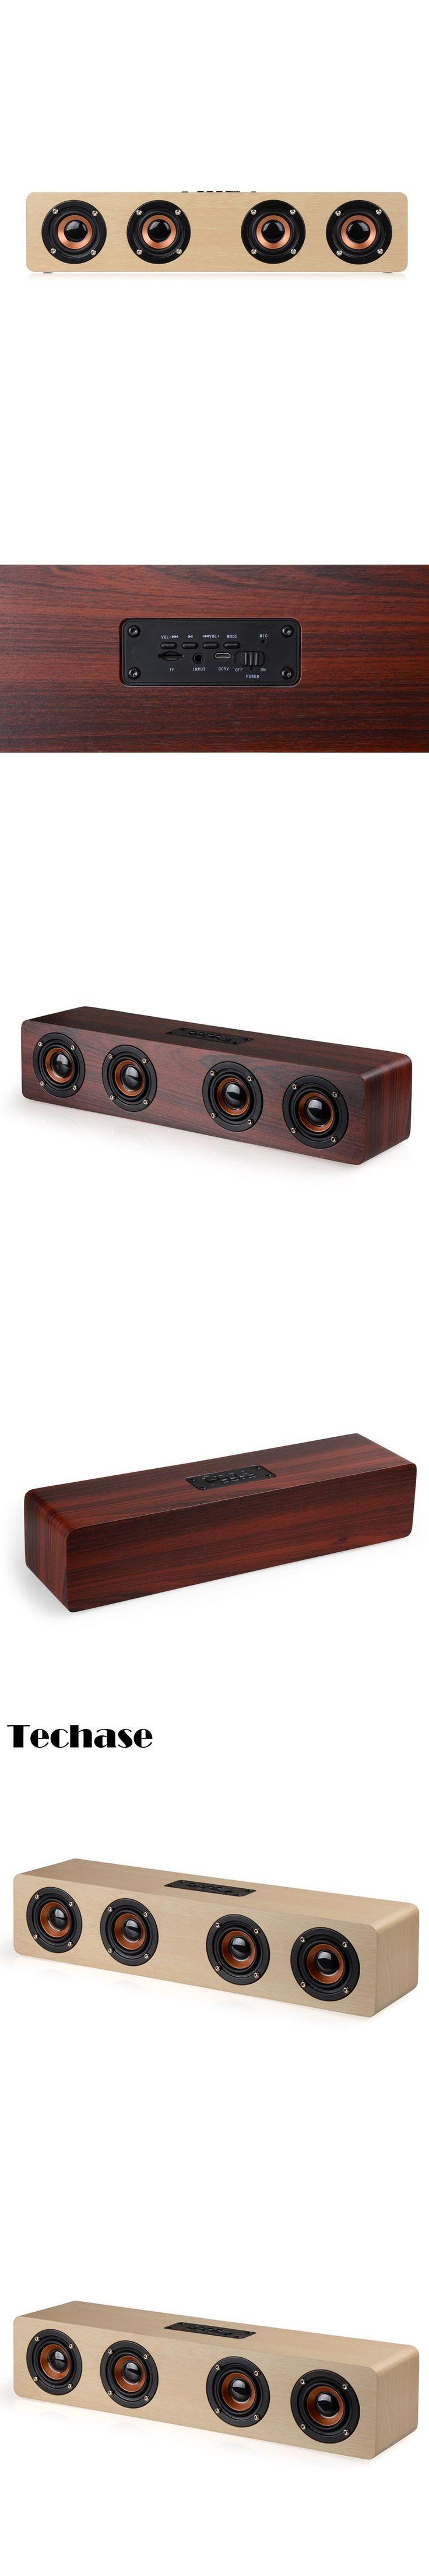 Techase HiFi Wooden Bluetooth Speaker Soundbar Subwoofer TF Card Speakers Parlante Bluetooth Portatil Caixa De Som Loudspeaker